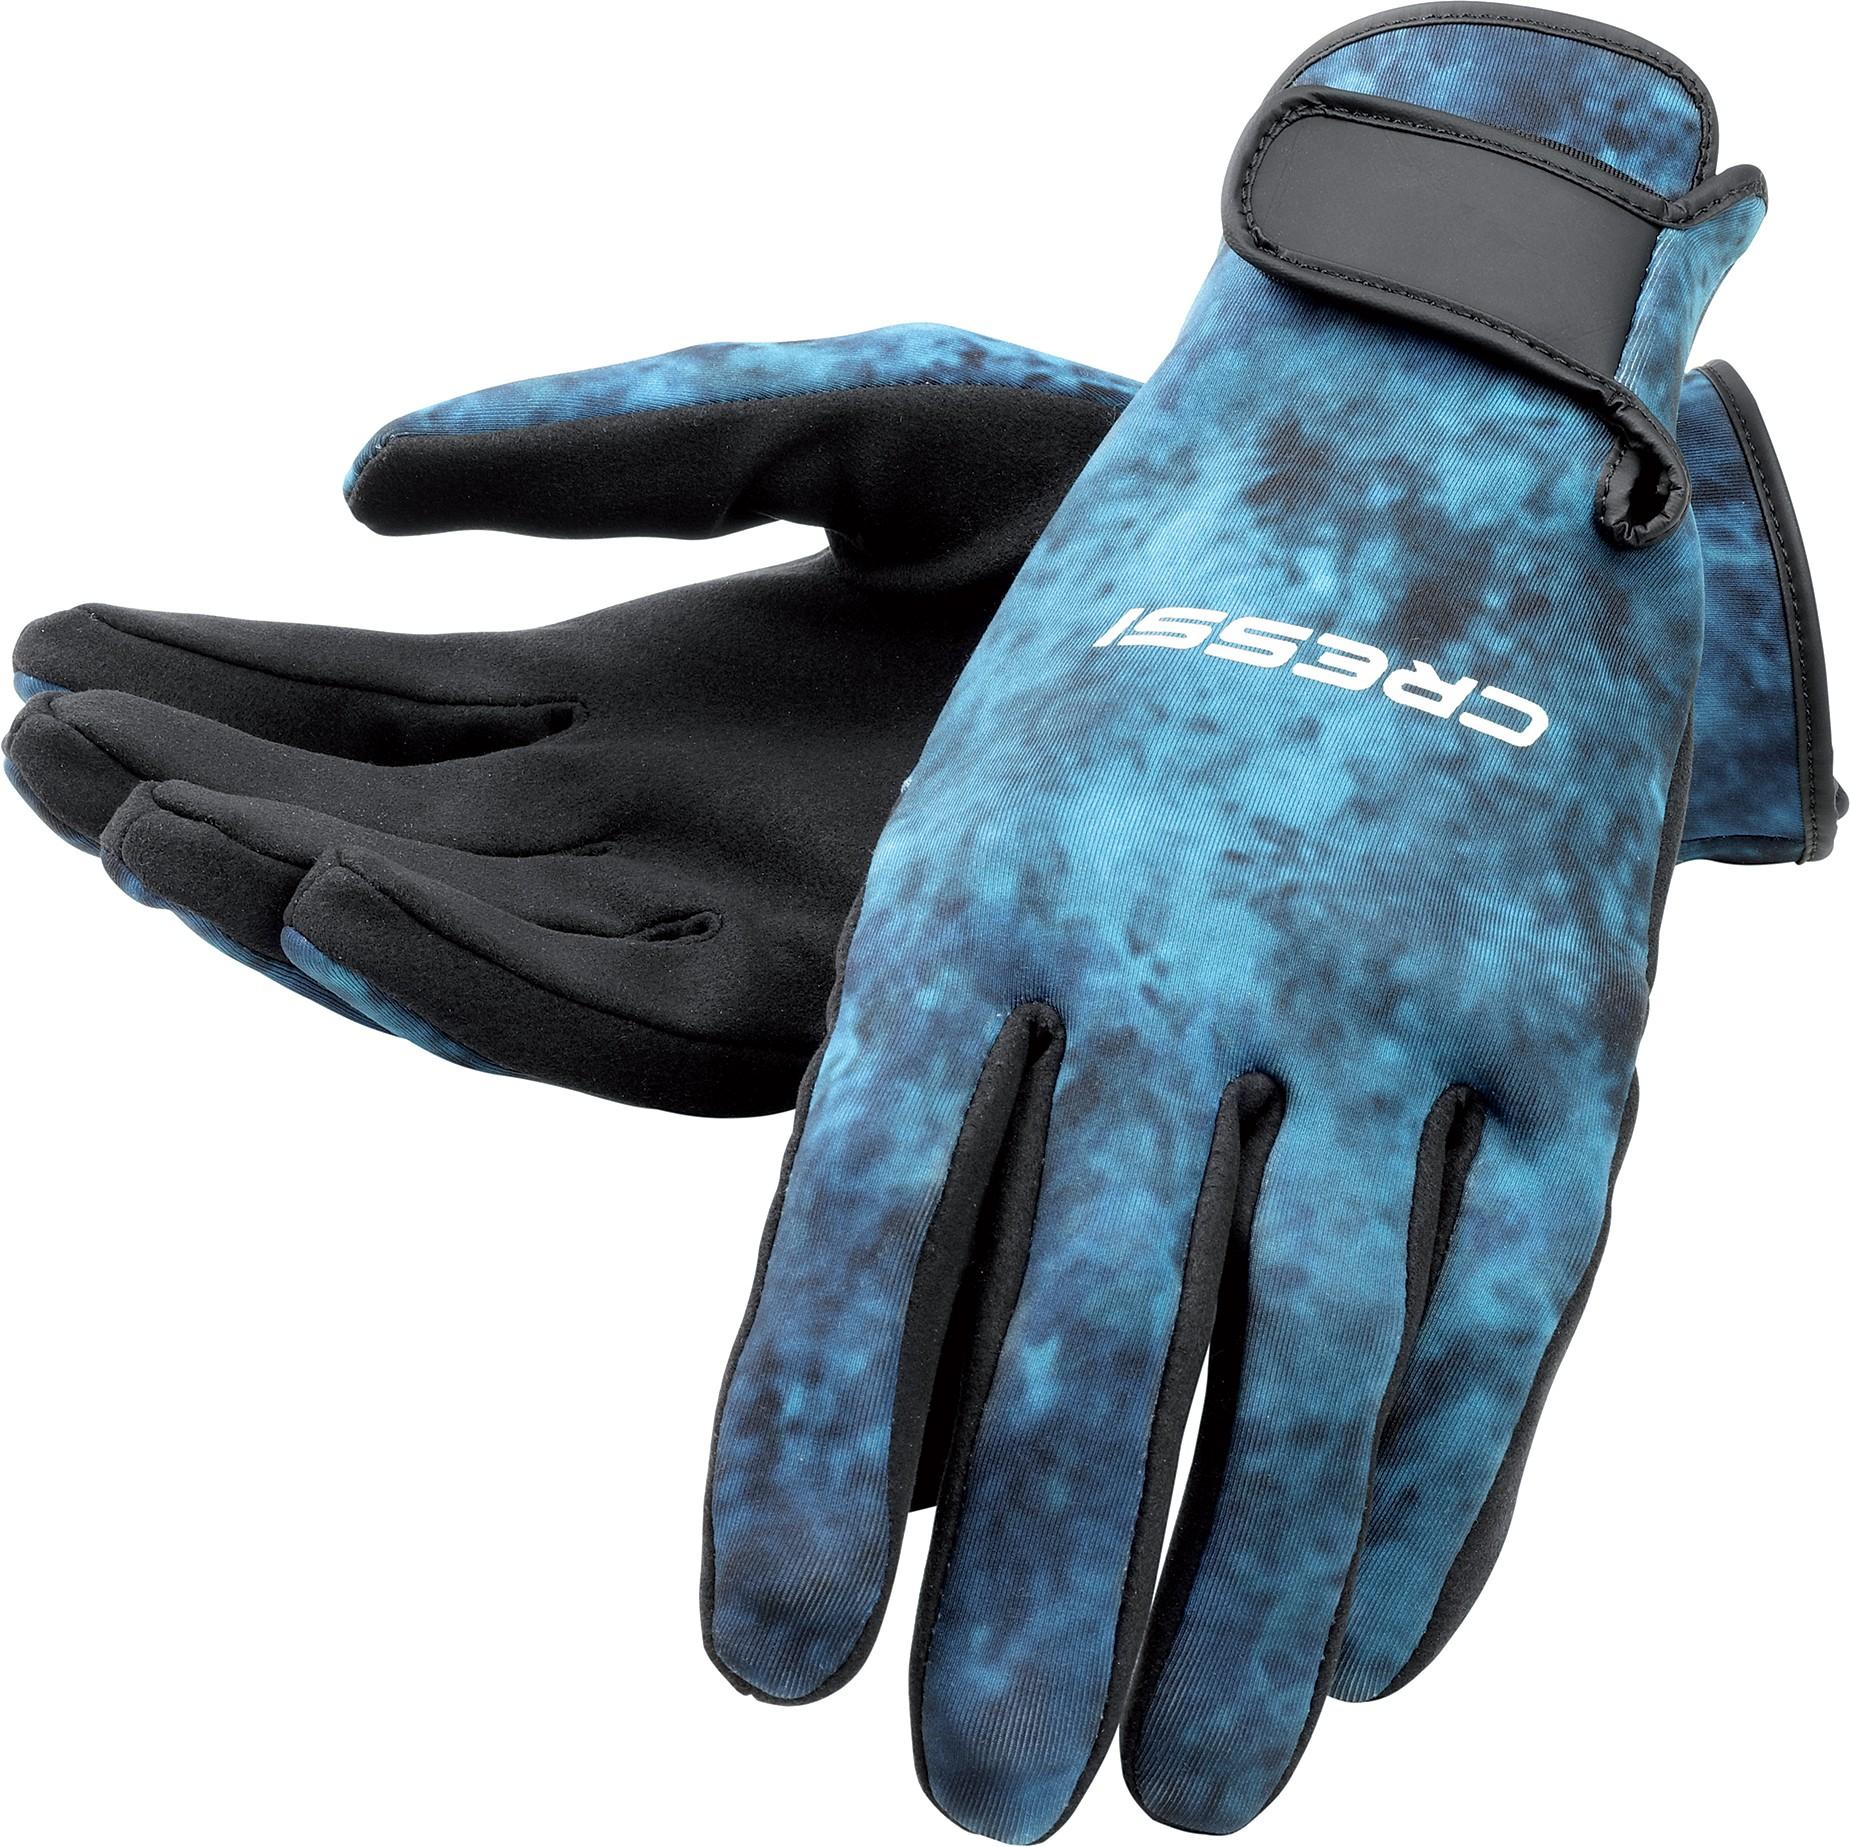 Cressi 2mm Blue Hunter Spearfishing Gloves